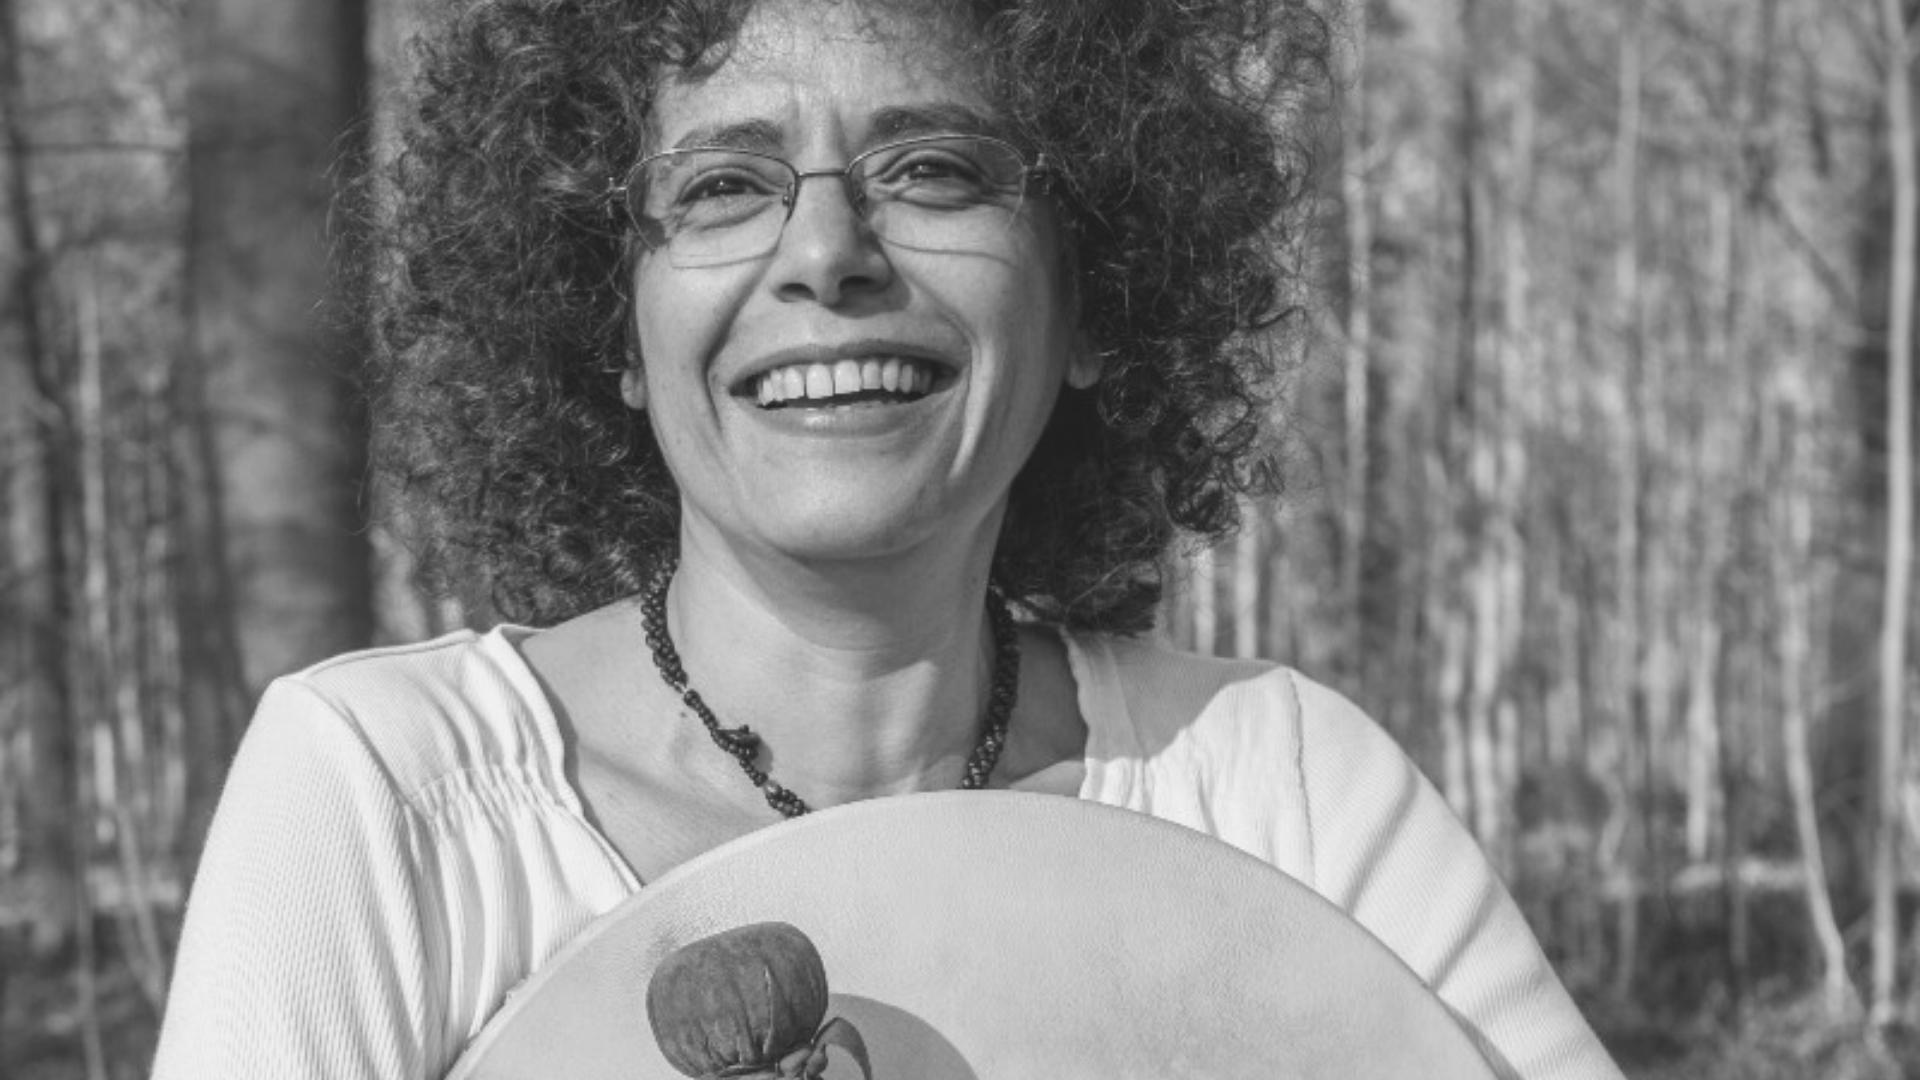 Rachida Drissi (MusicoterreHappy), une smart woman qui adoucit les coeurs